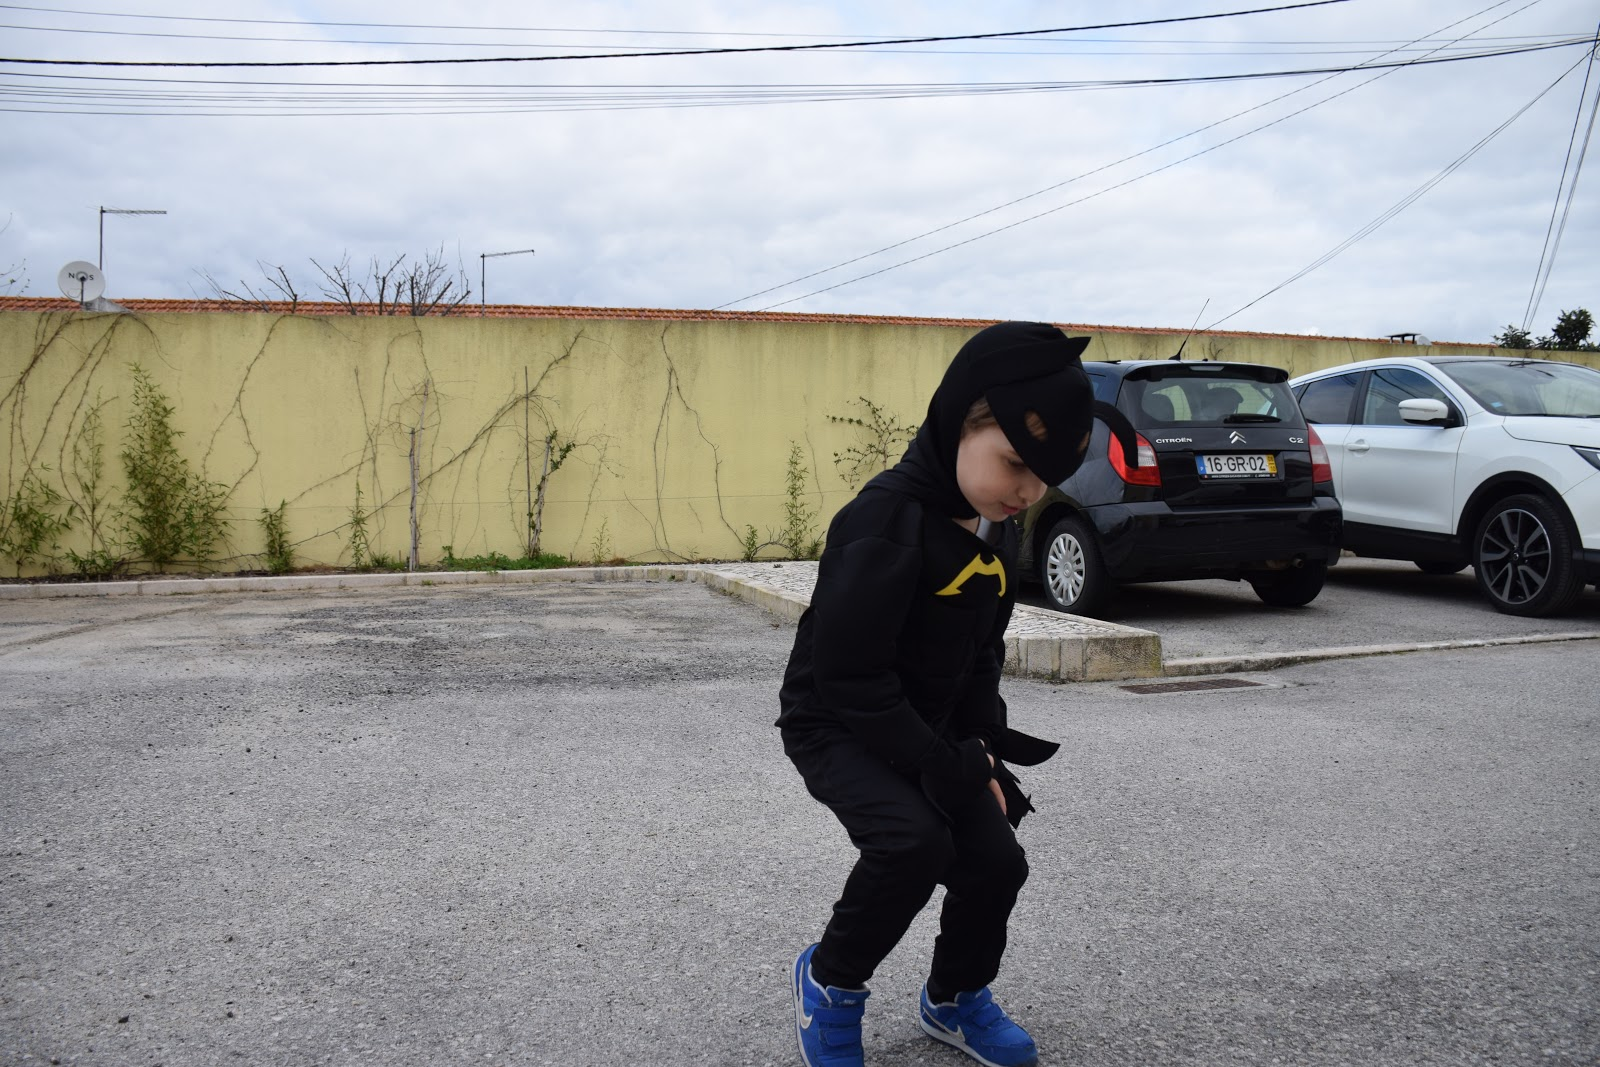 http://combicharocoscarpinteiros.blogspot.pt